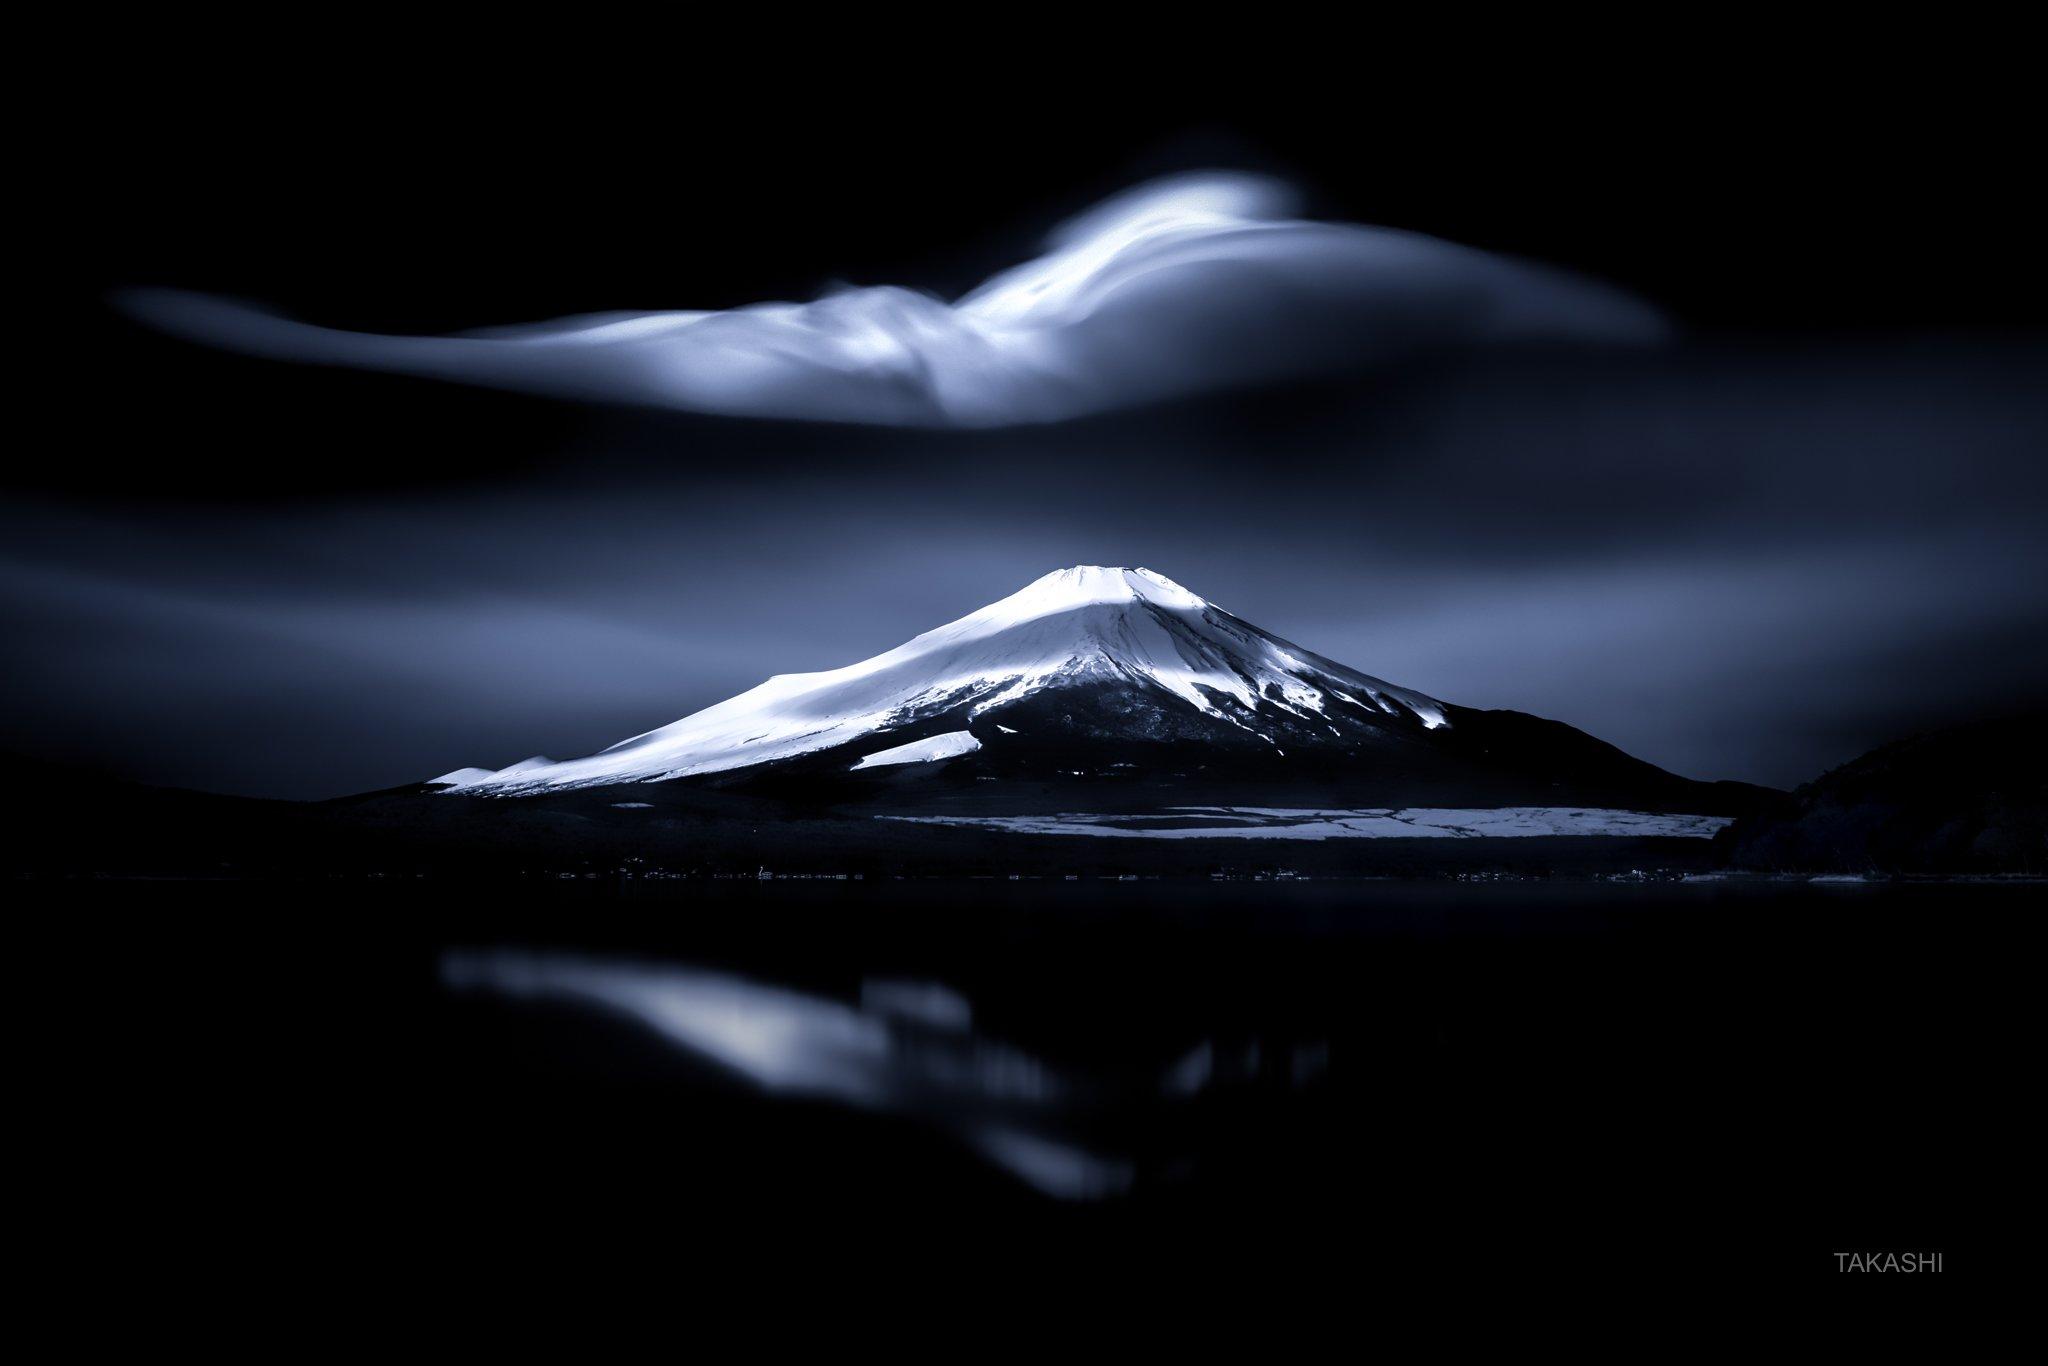 Fuji,Japan,mountain,cloud,snow,lake,reflection, Takashi